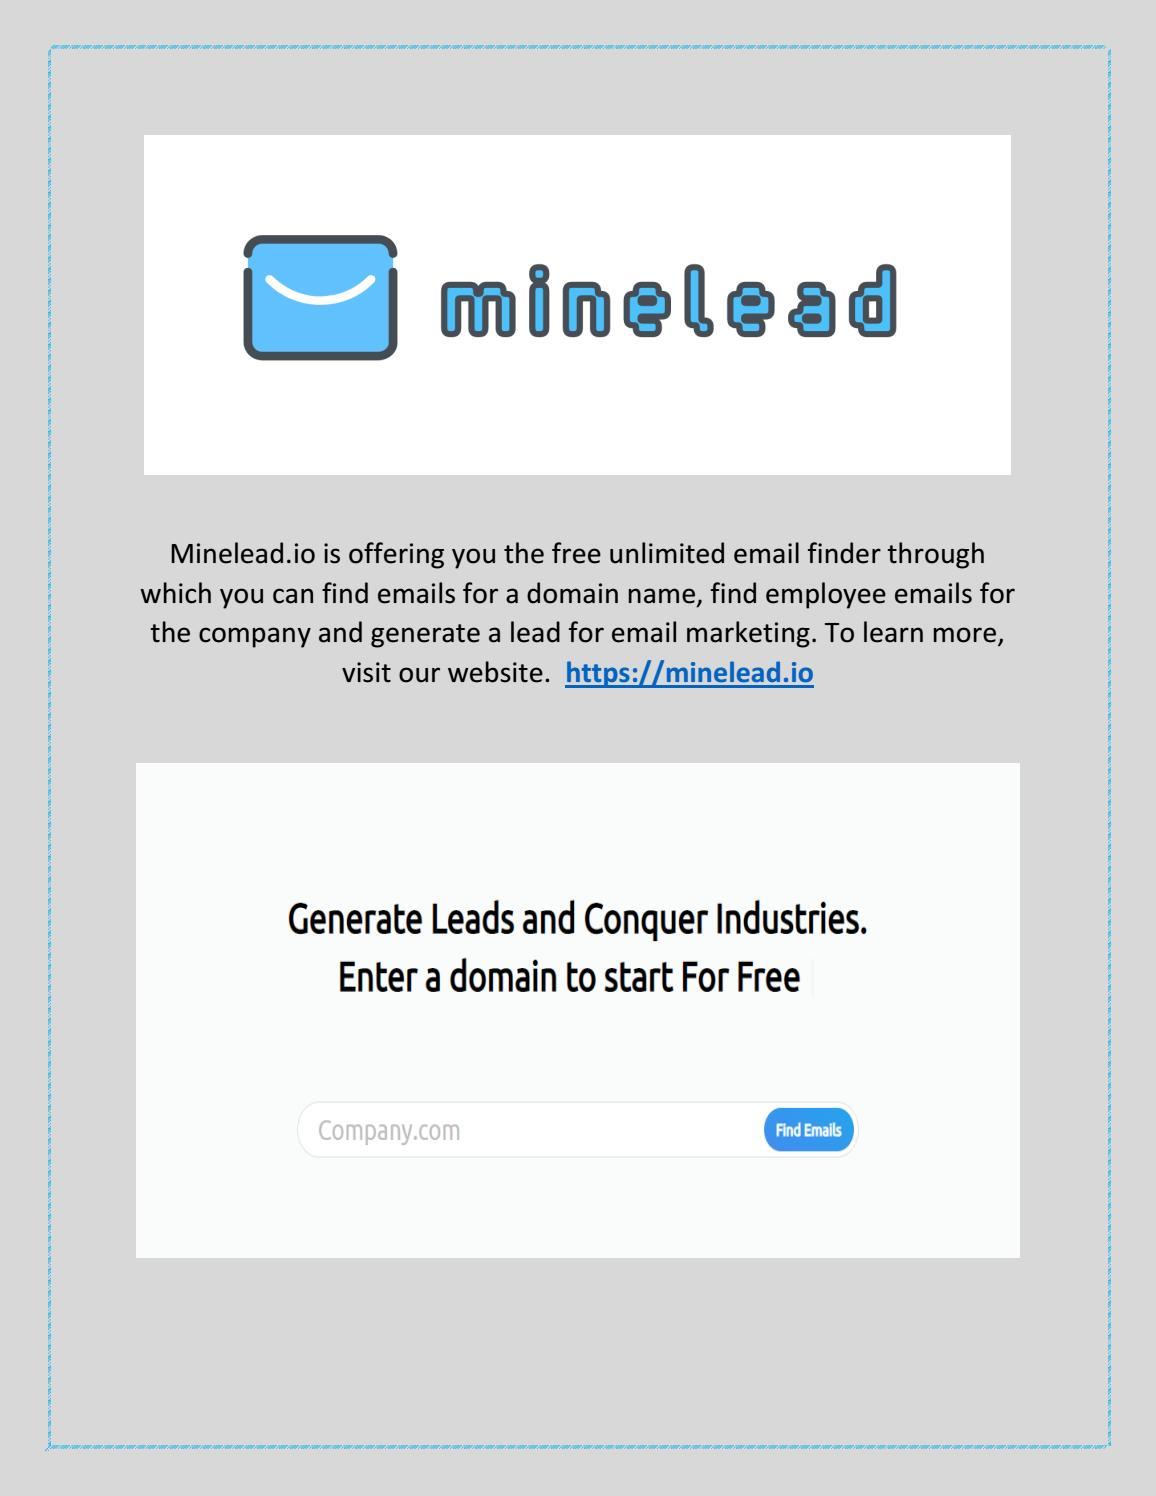 Free Unlimited Email Finder   Minelead.io by mineleadltd   issuu